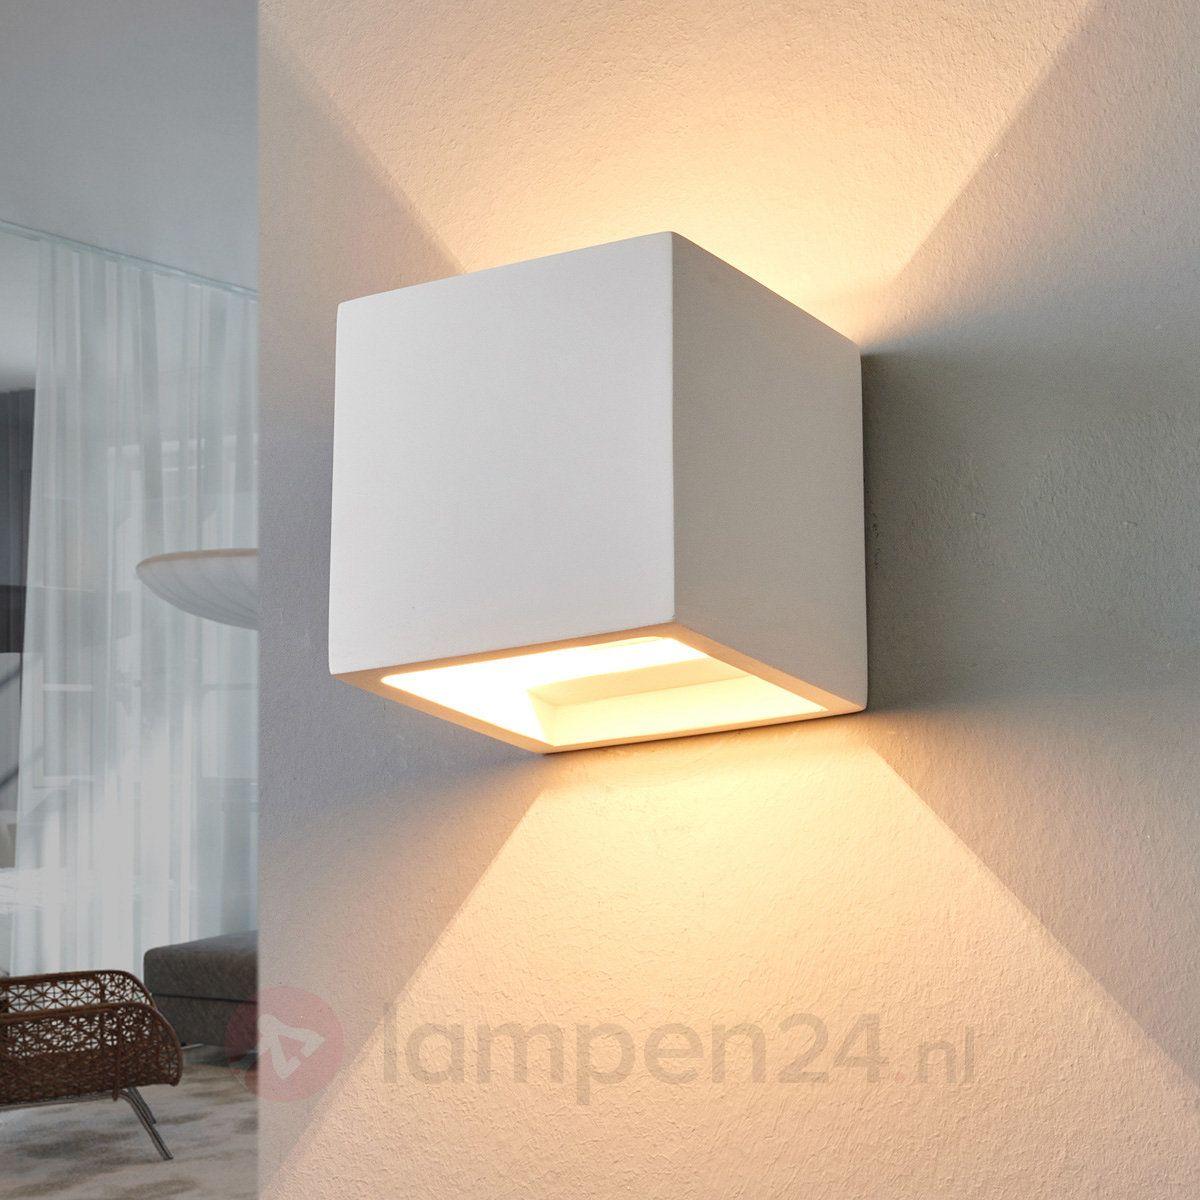 Bescheiden halogeen wandlamp Freja van gips | Lights